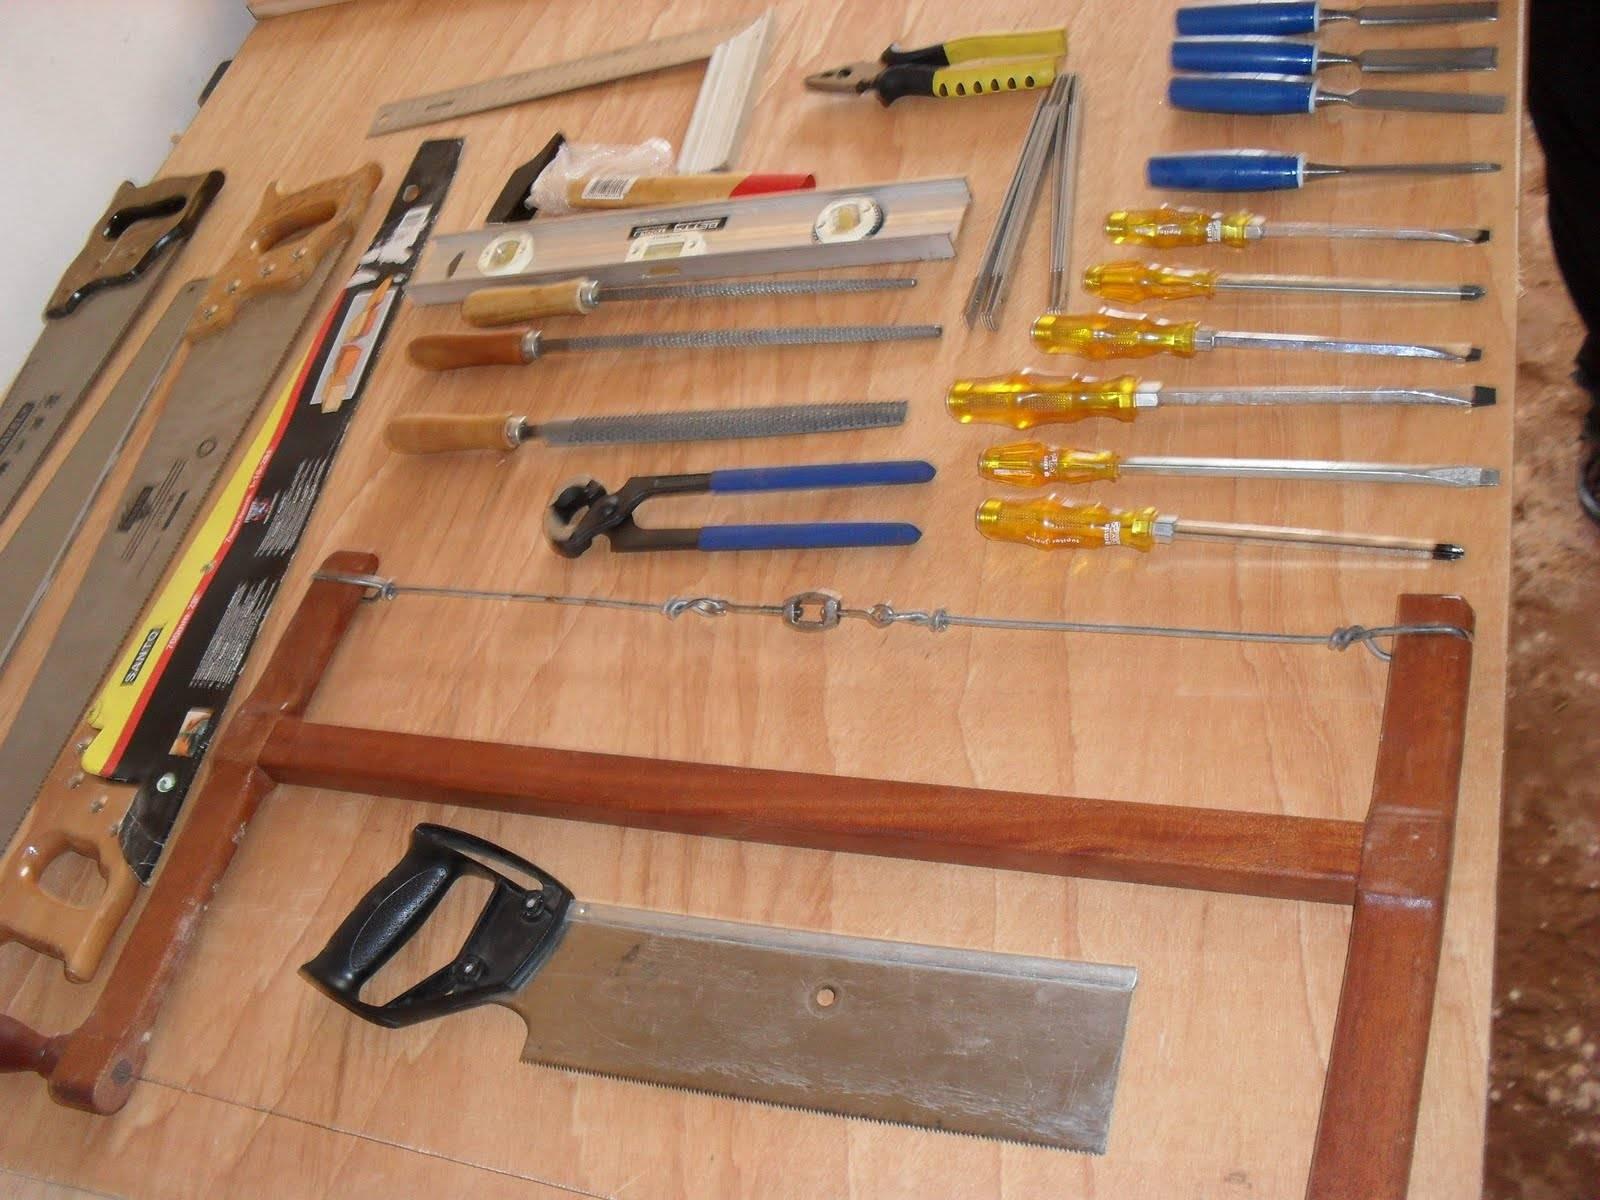 Marceneiro: equipamentos e ferramentas para marcenaria #A89423 1600x1200